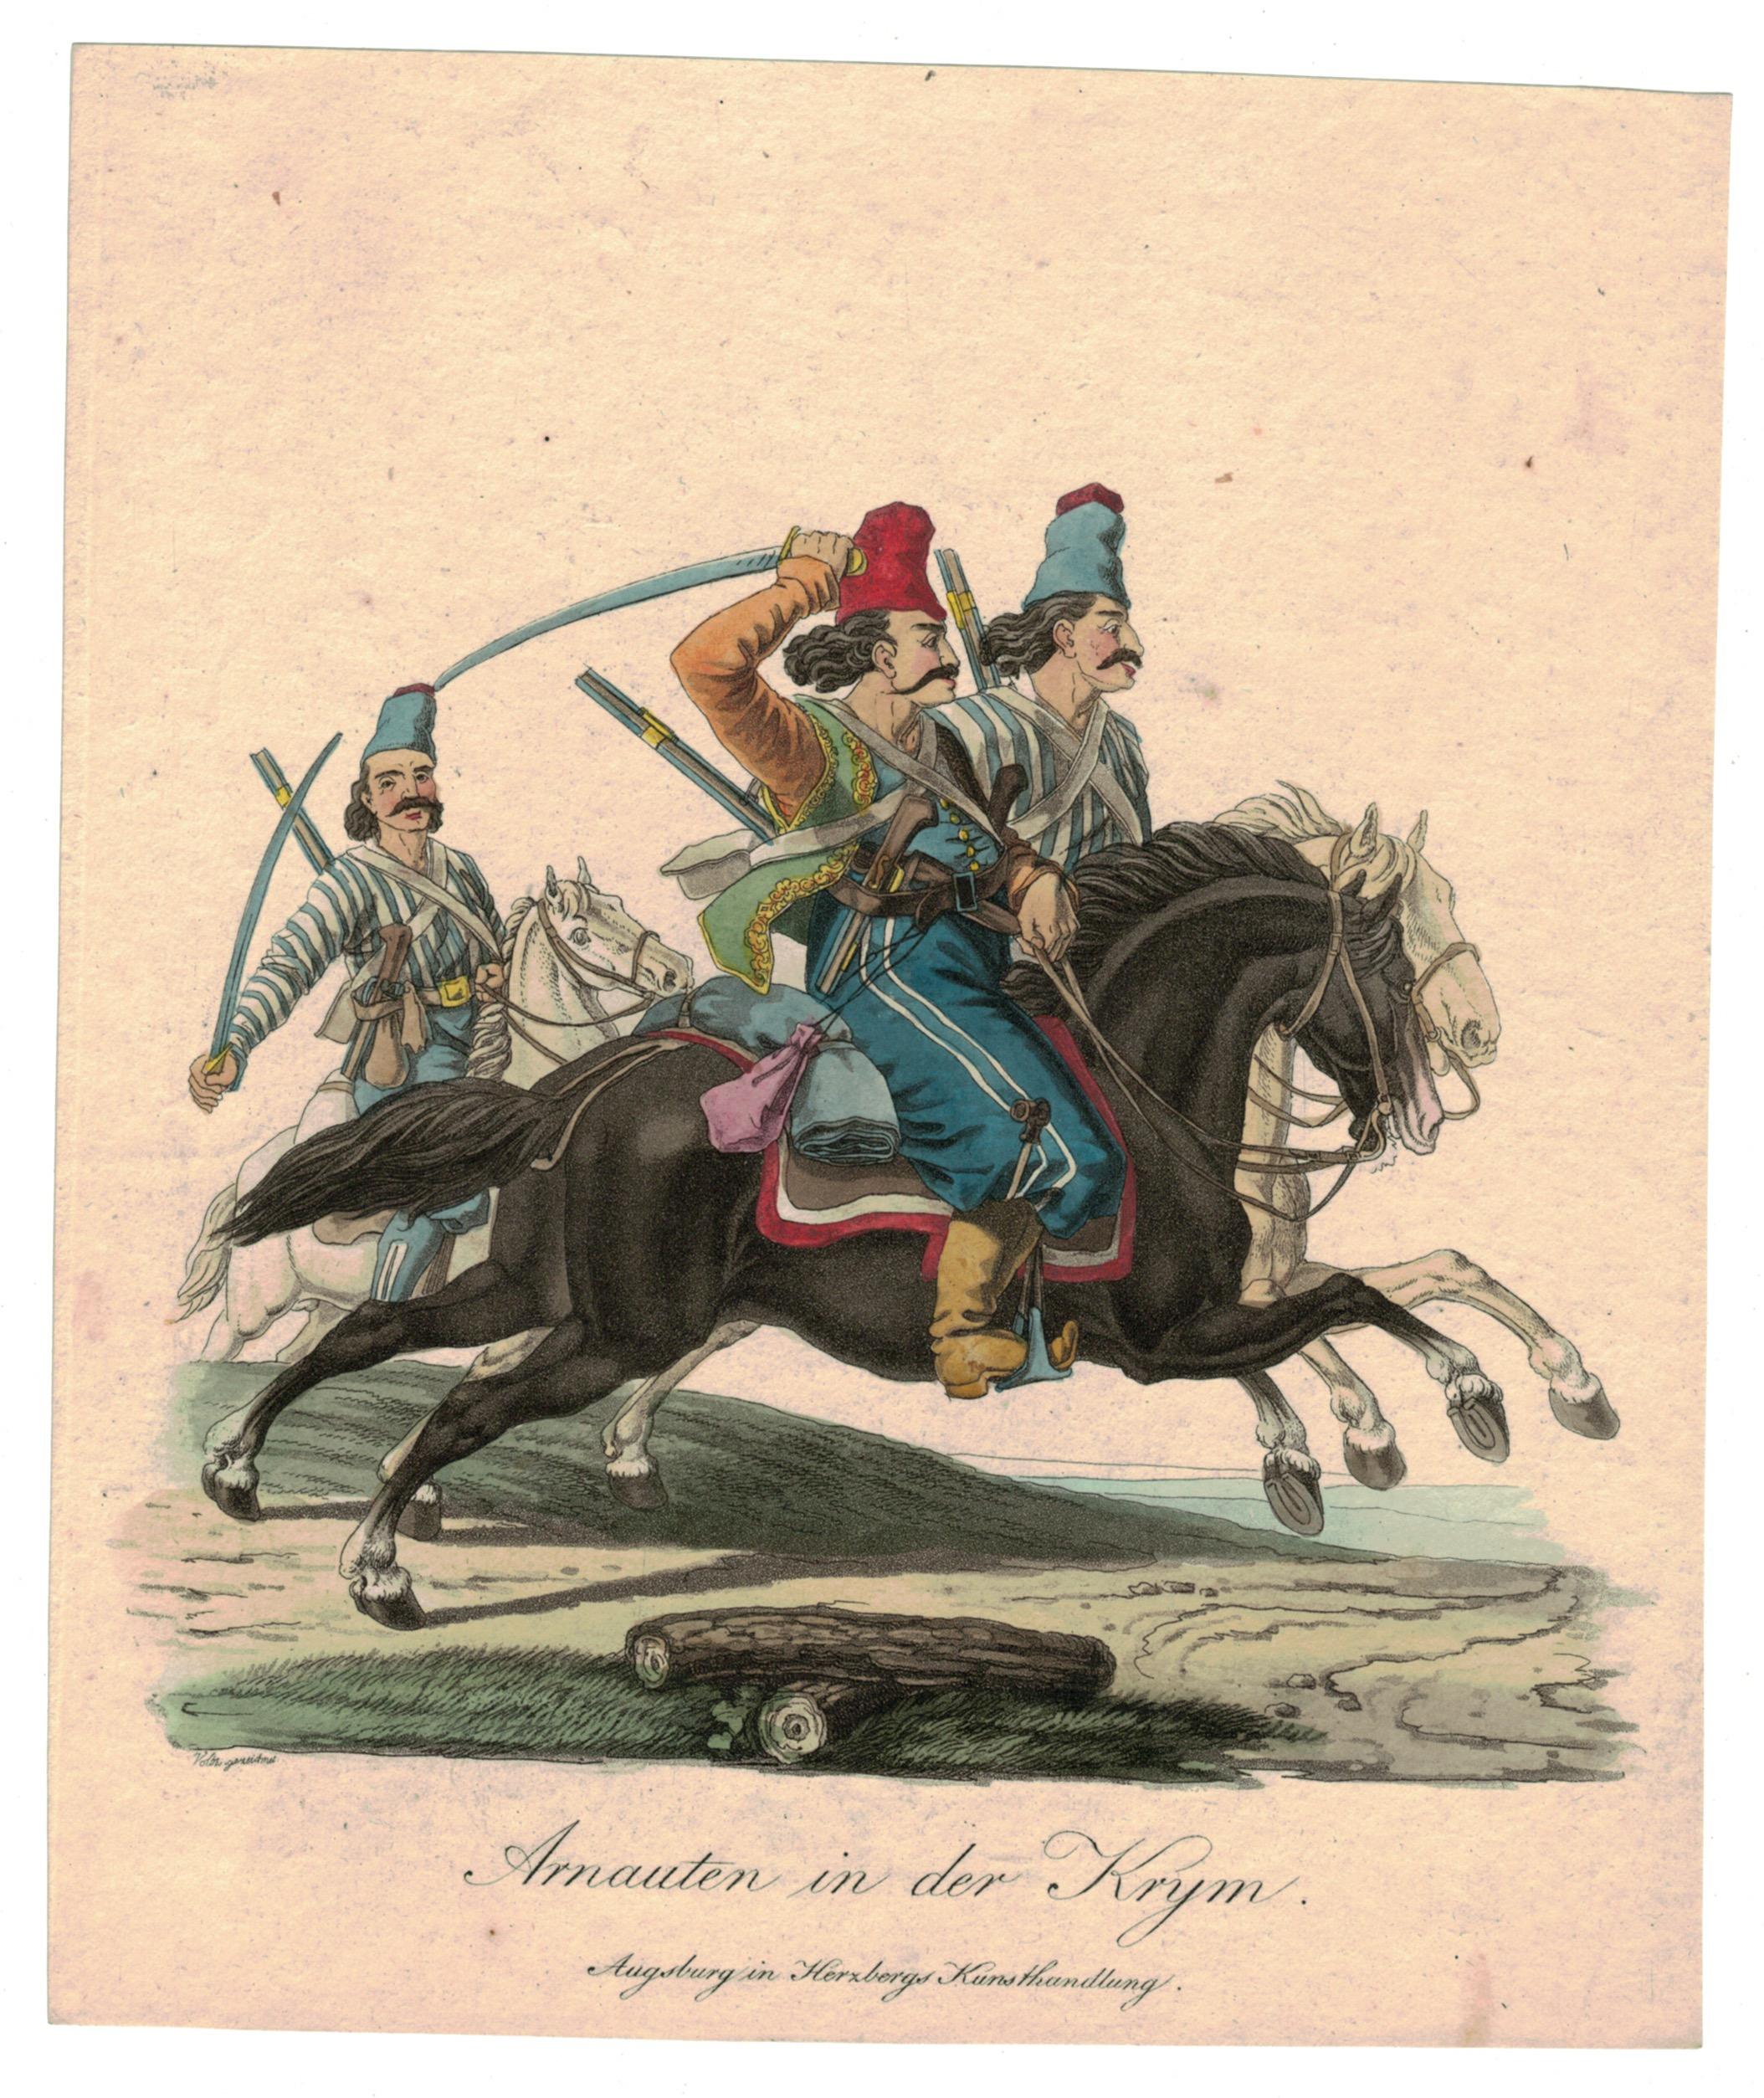 Gravure XIX - Cosaques - Russie - Cavalier - Guerres Napoléoniennes - 1812 - Napoléon I - Borodino - Arnauten in der Krym